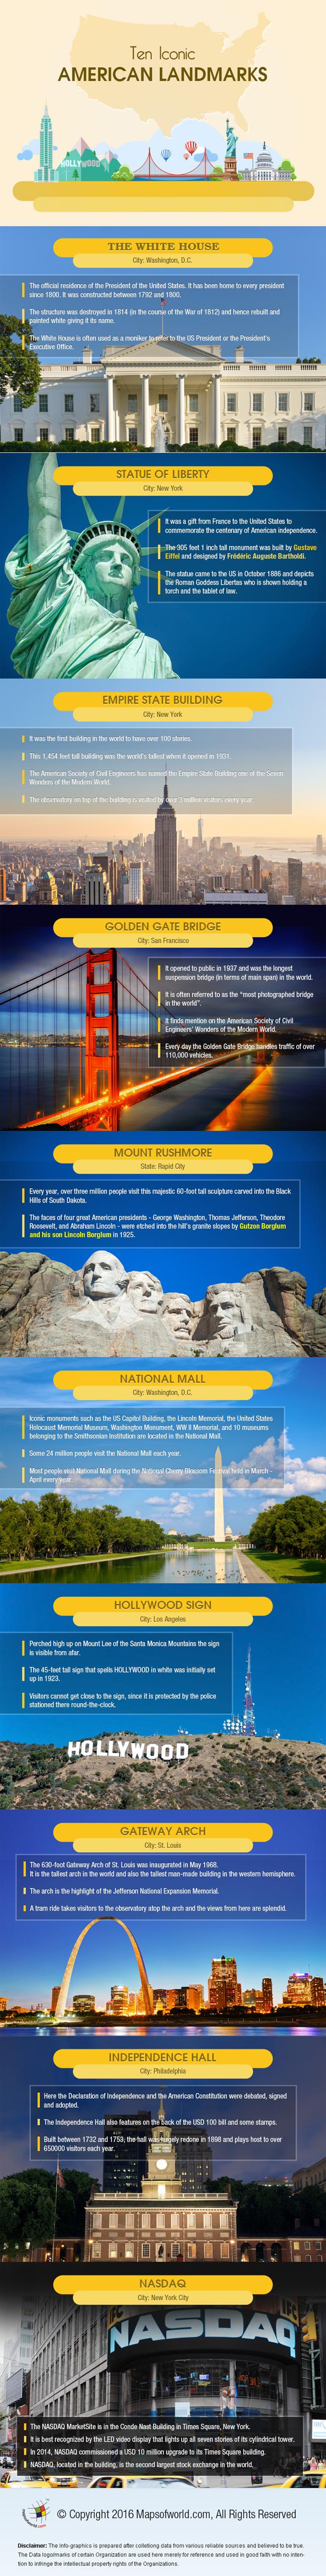 10 Iconic American Landmarks Infographic